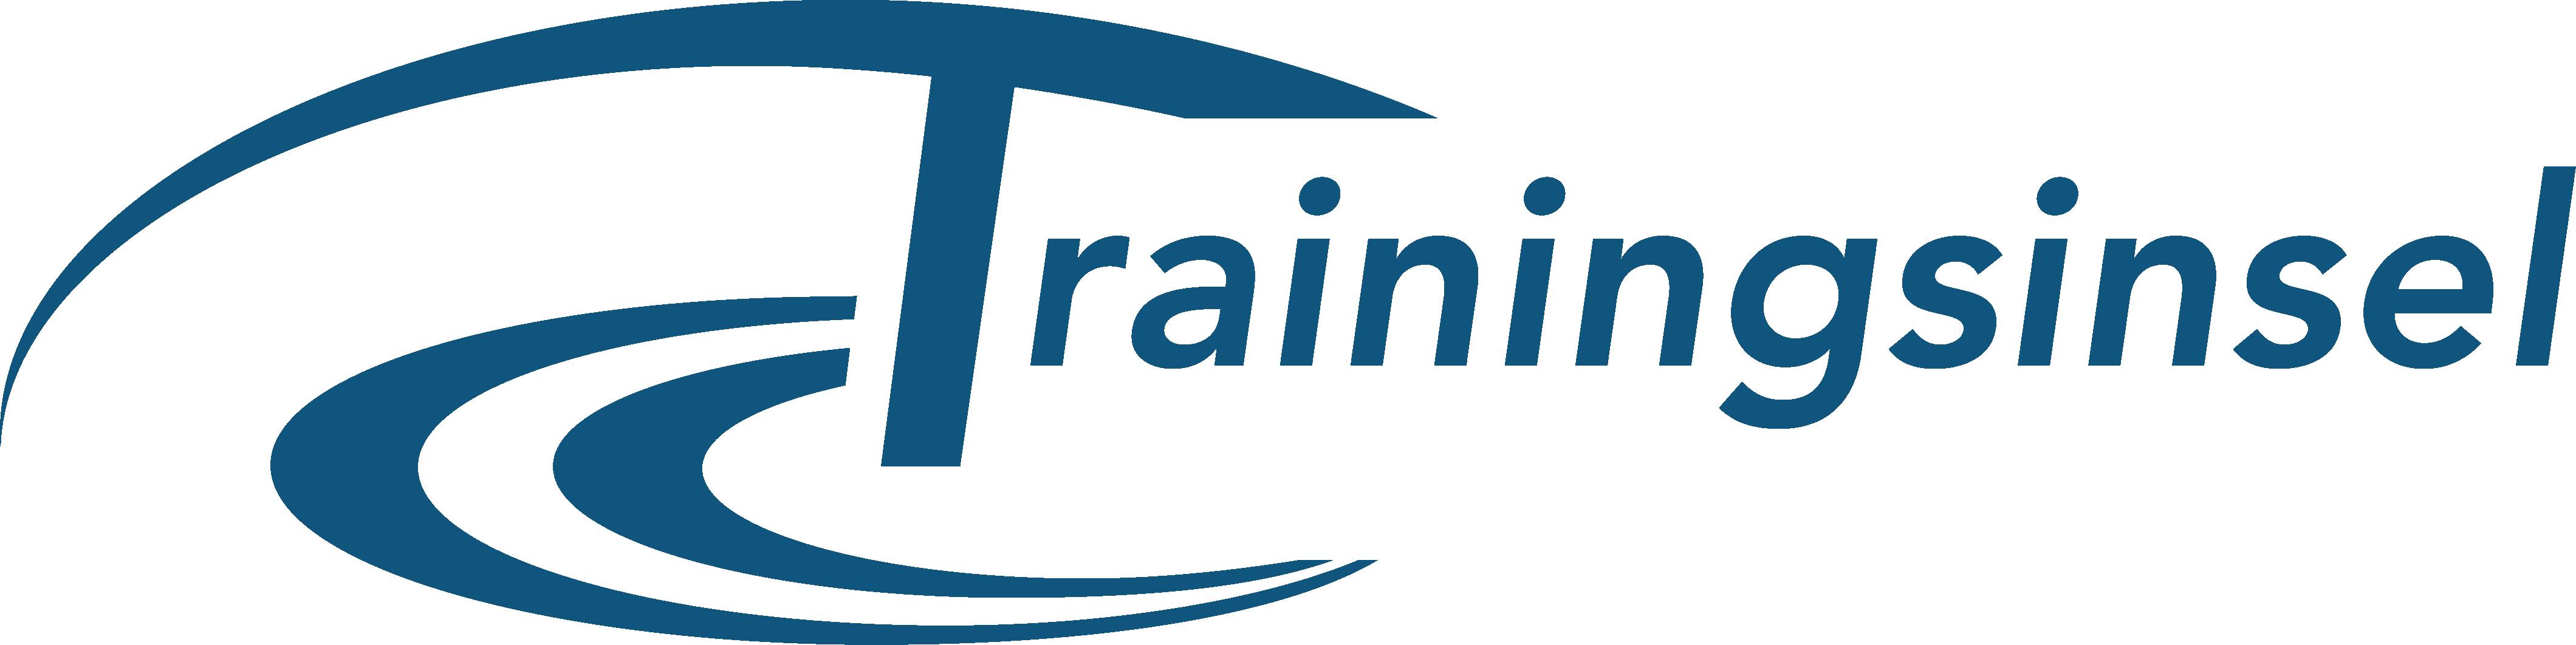 Trainingsinsel_Logo-blau transparenter Hintergrund